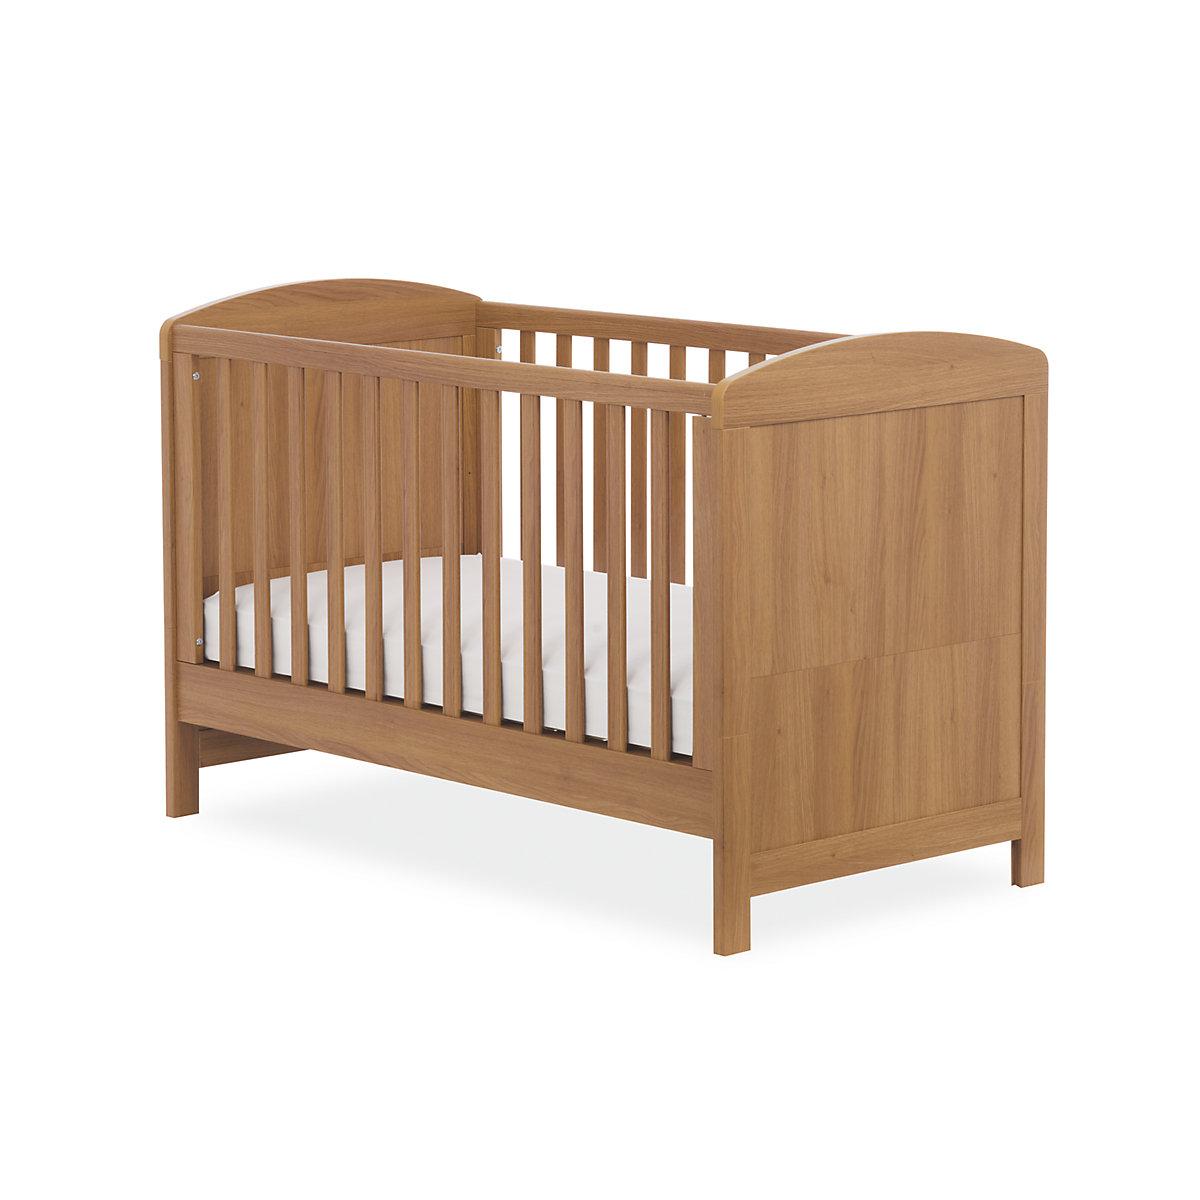 Travel Cot Mattress Tesco: Mothercare Padstow Cot Bed- Oak Effect